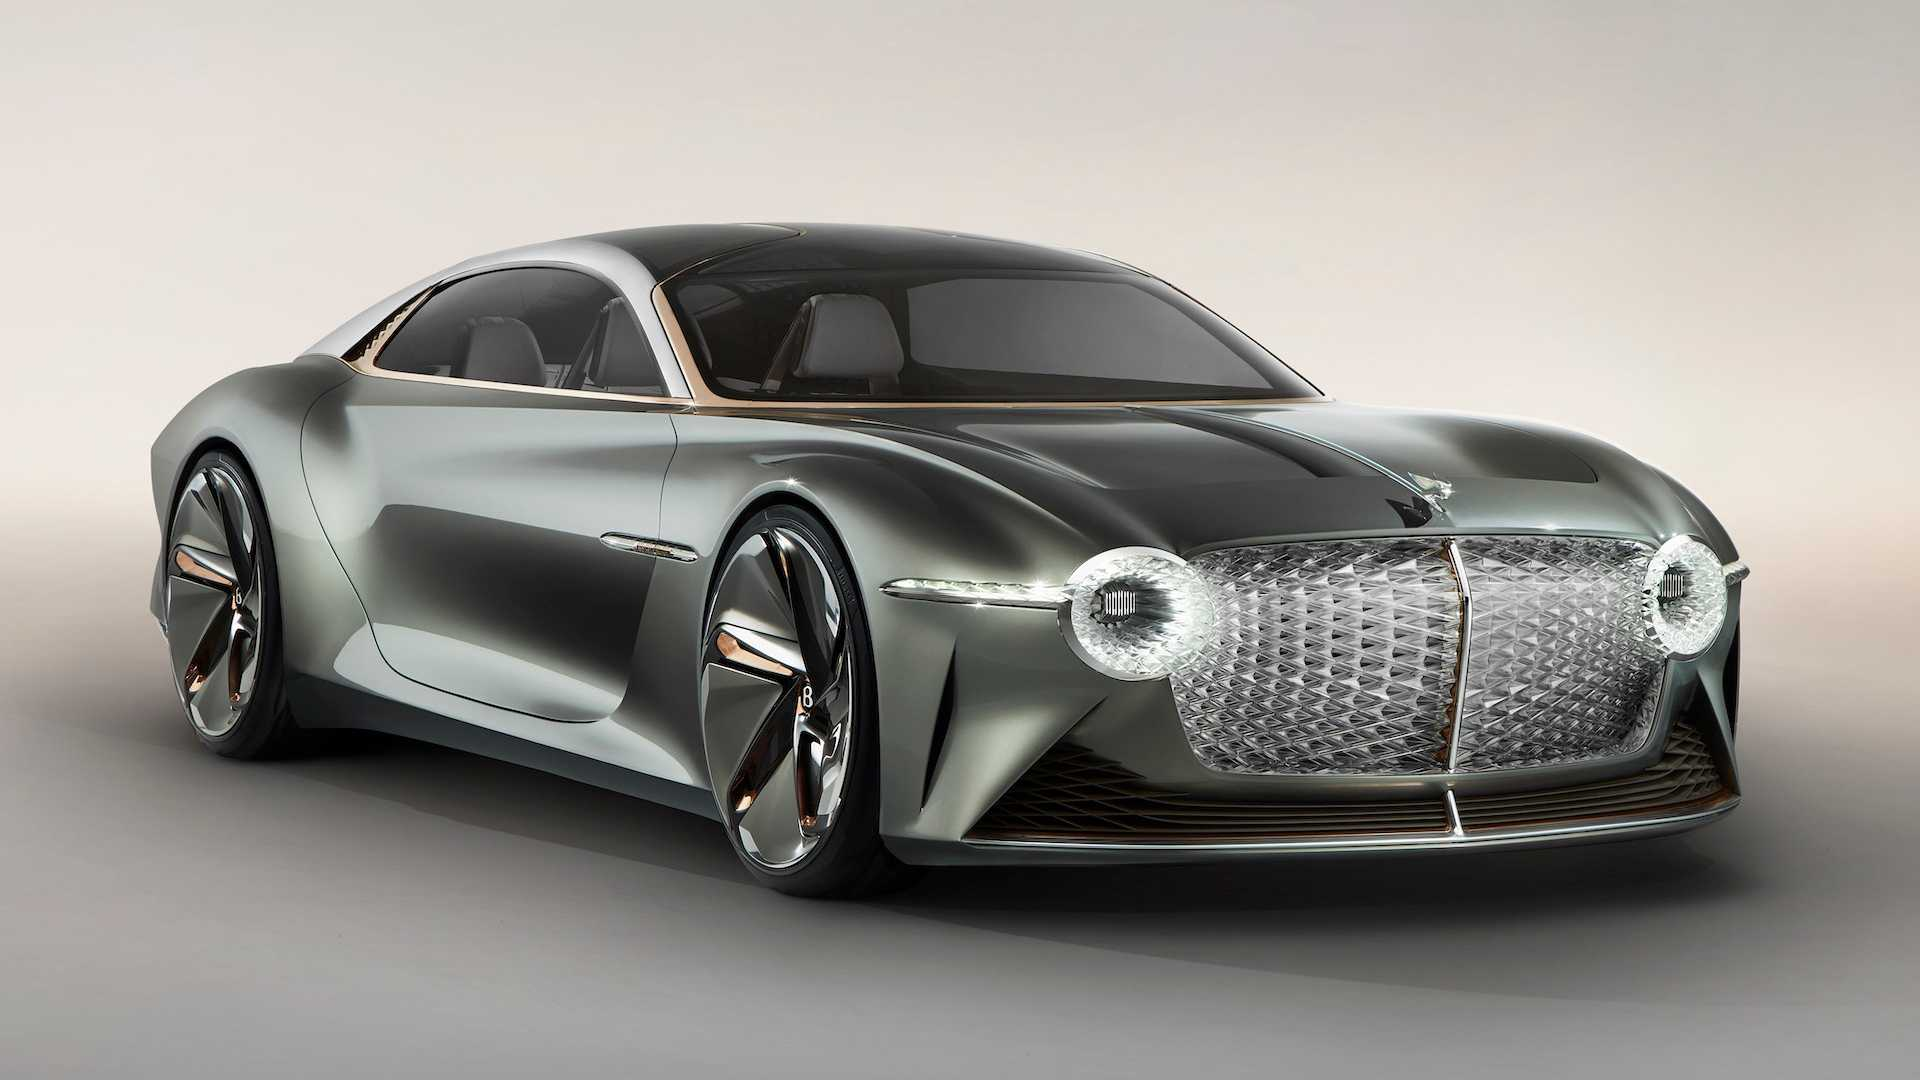 Bentley EXP 100 GT concept revealed as extravagant EV for 2035